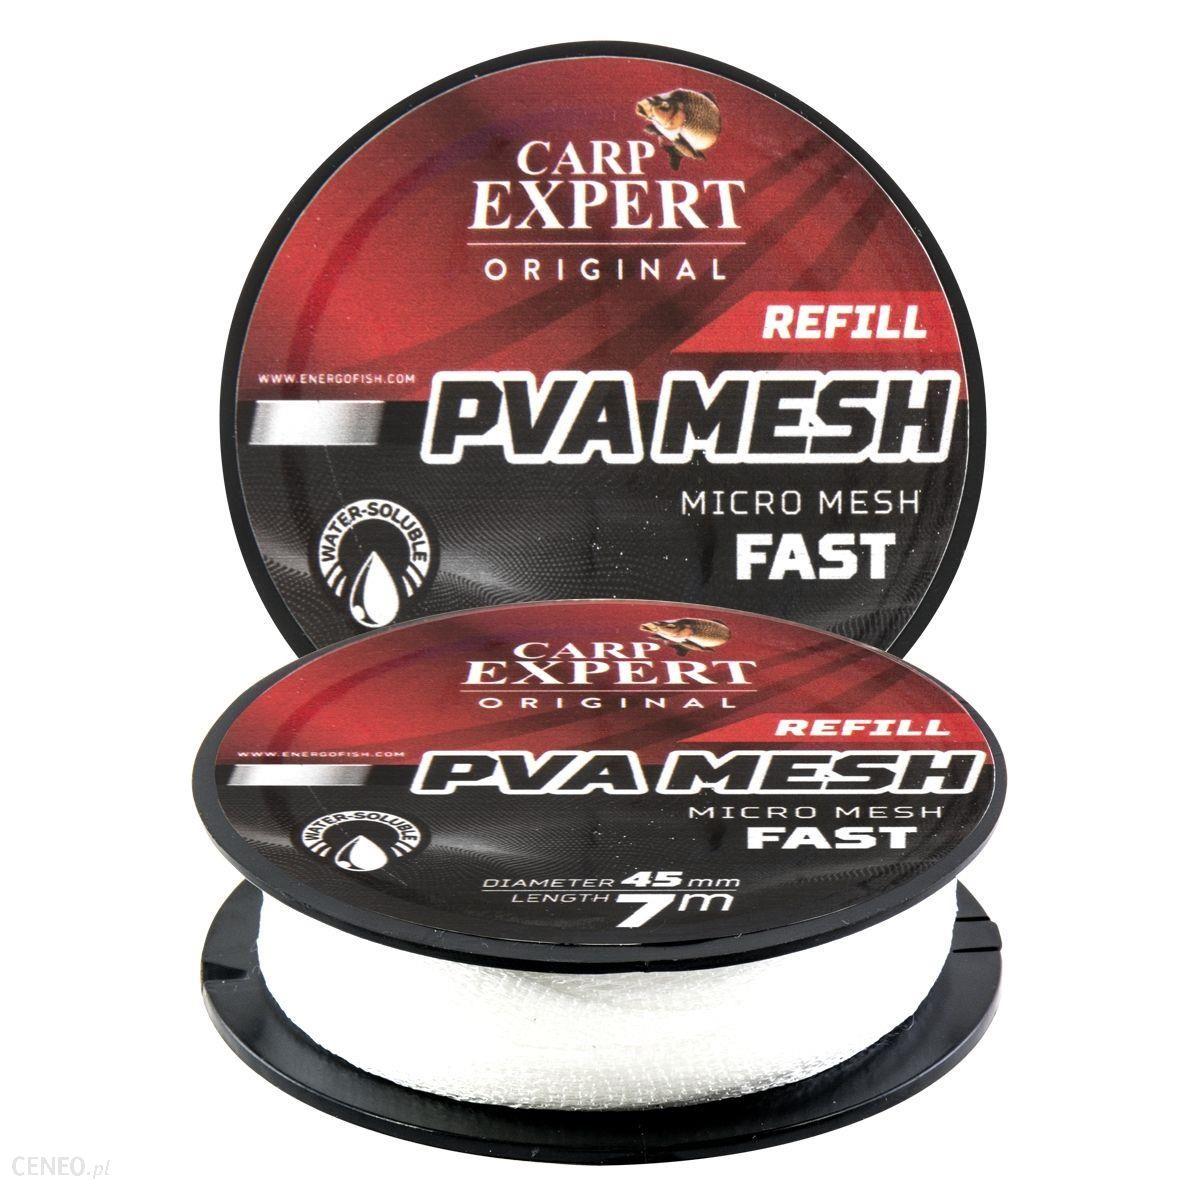 Energofish Carp Expert Pva Uzupełnienie 35Mm 7M